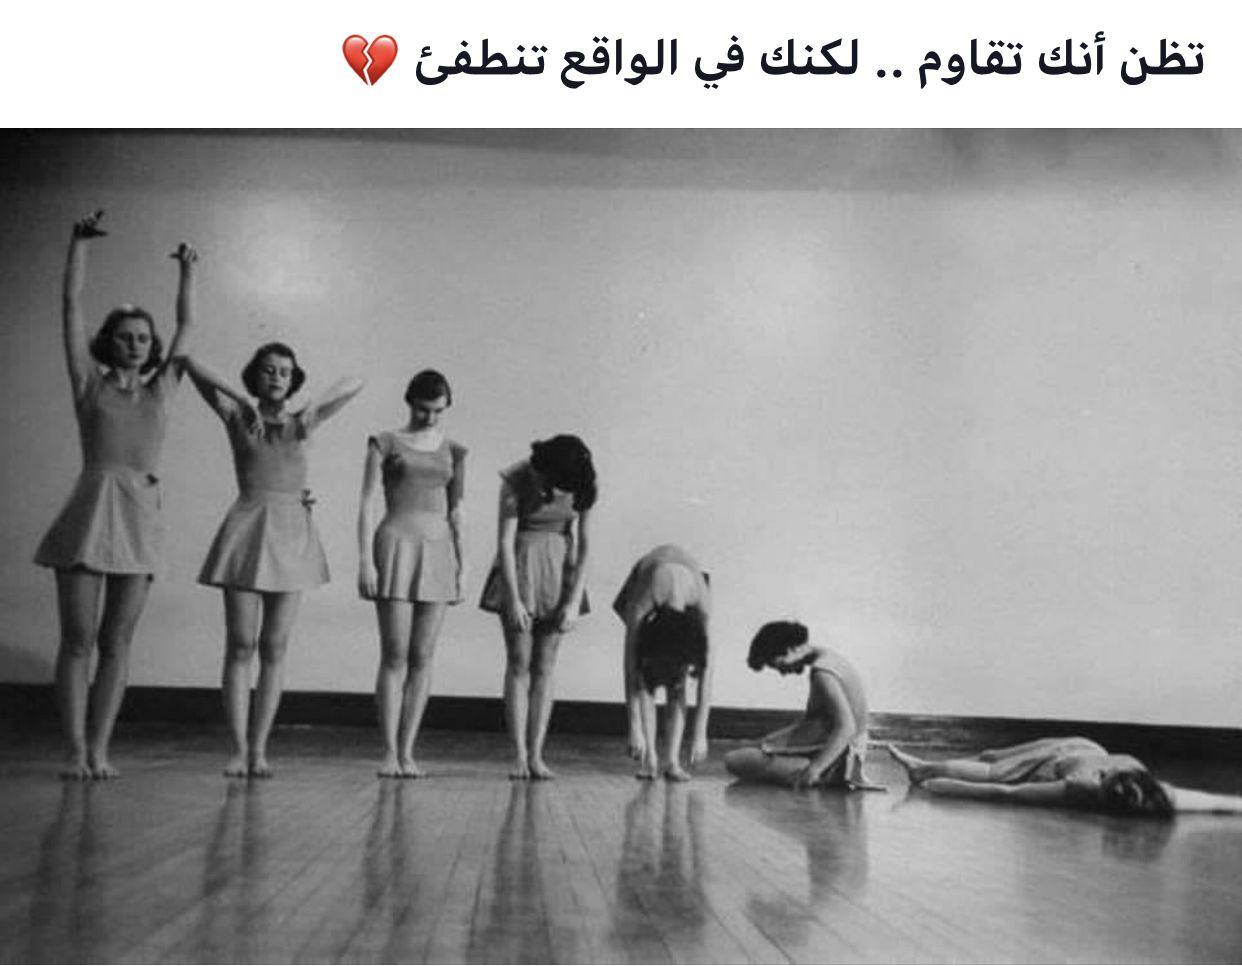 Pin By Sara Saro On Klam Arabic Jokes Quotes Deep Arabic Quotes